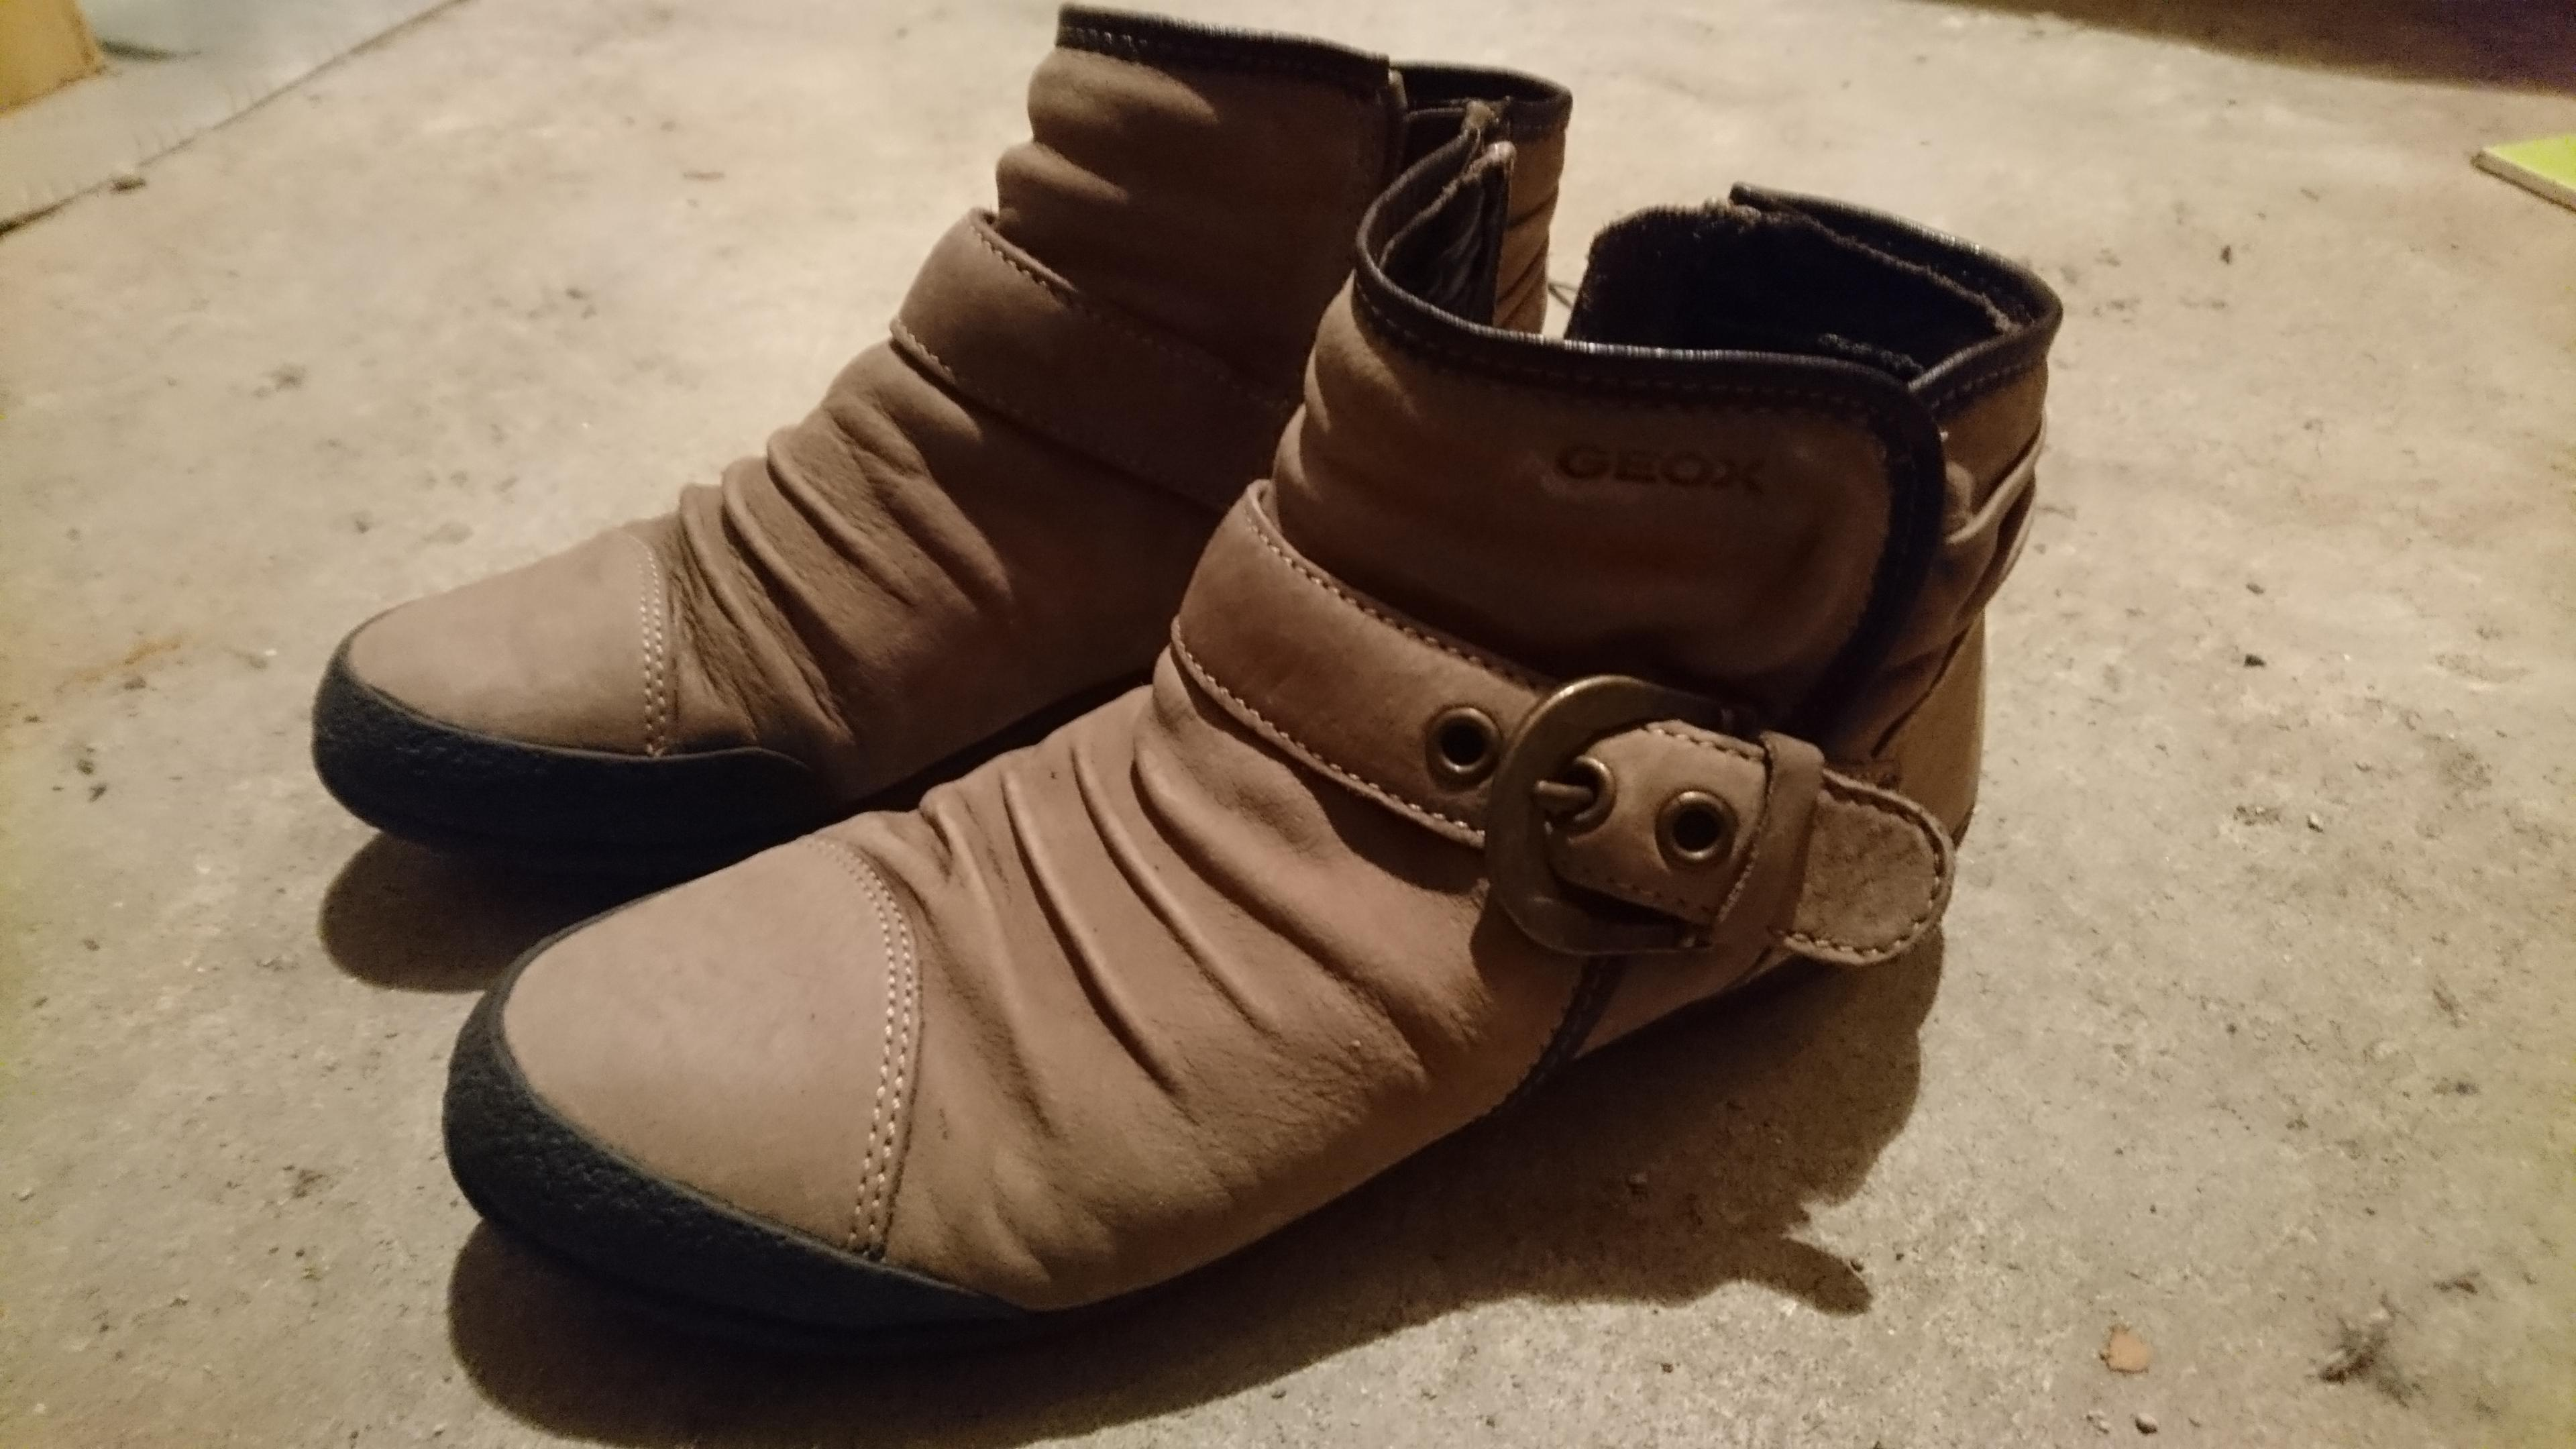 troc de troc chaussures geox image 1